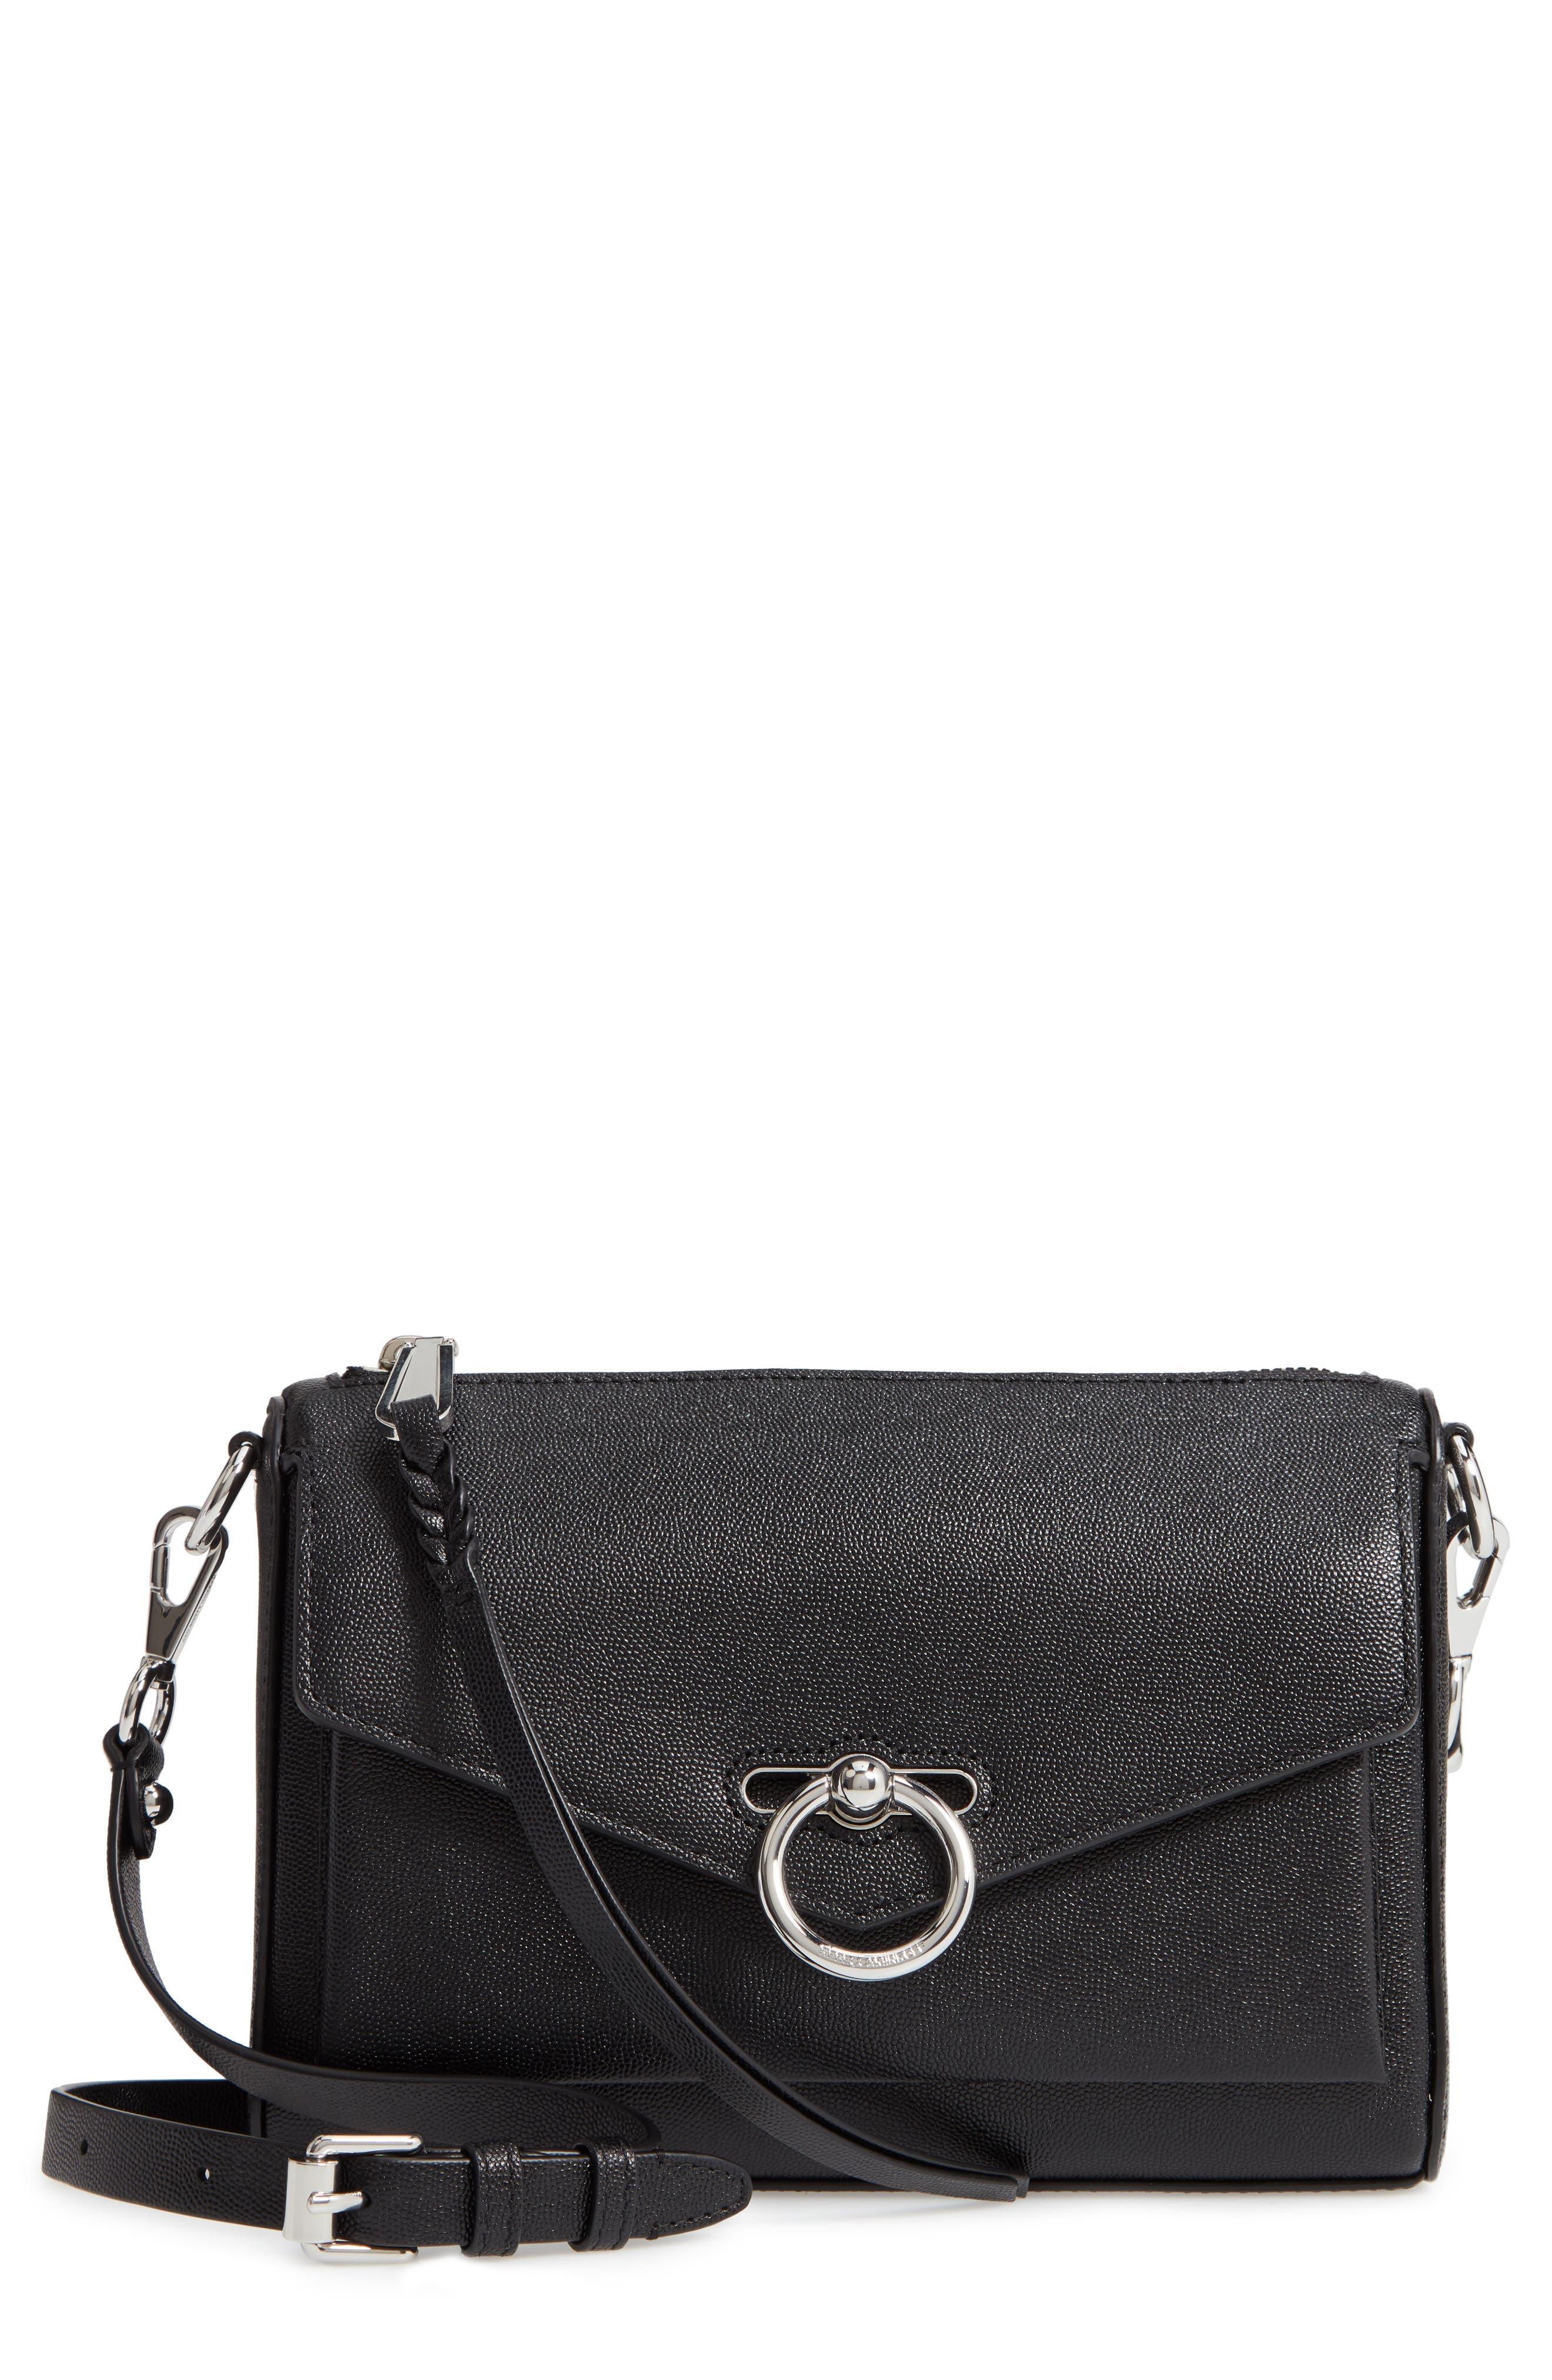 REBECCA MINKOFF Jean MAC Convertible Crossbody Bag, Main, color, BLACK